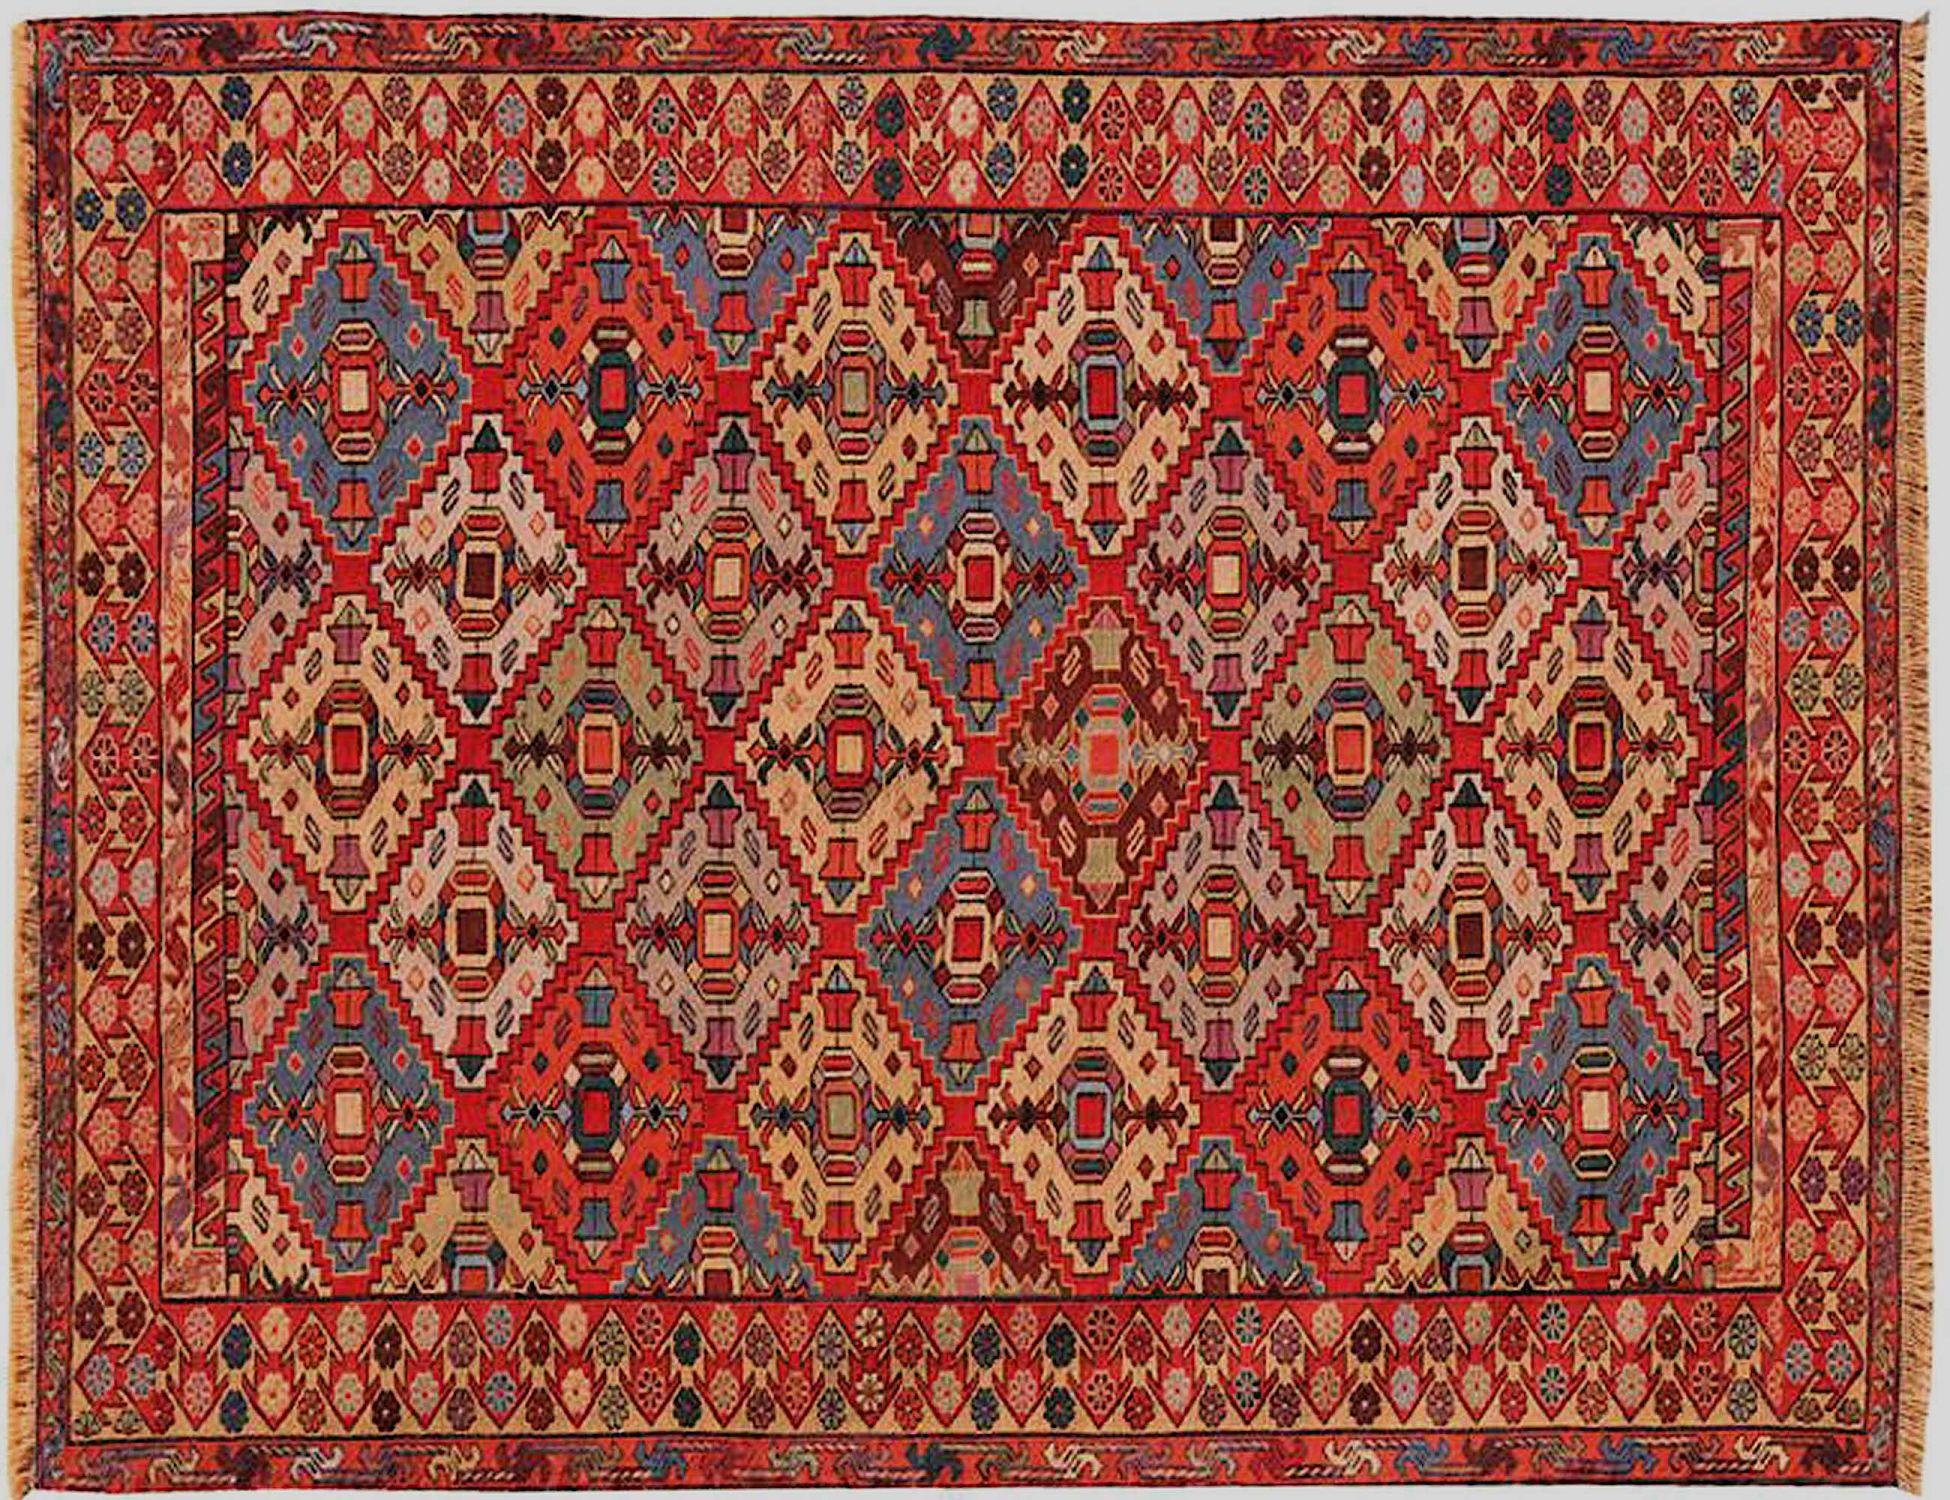 PERSIAN WOOL KILIMS    <br/>204 x 127 cm